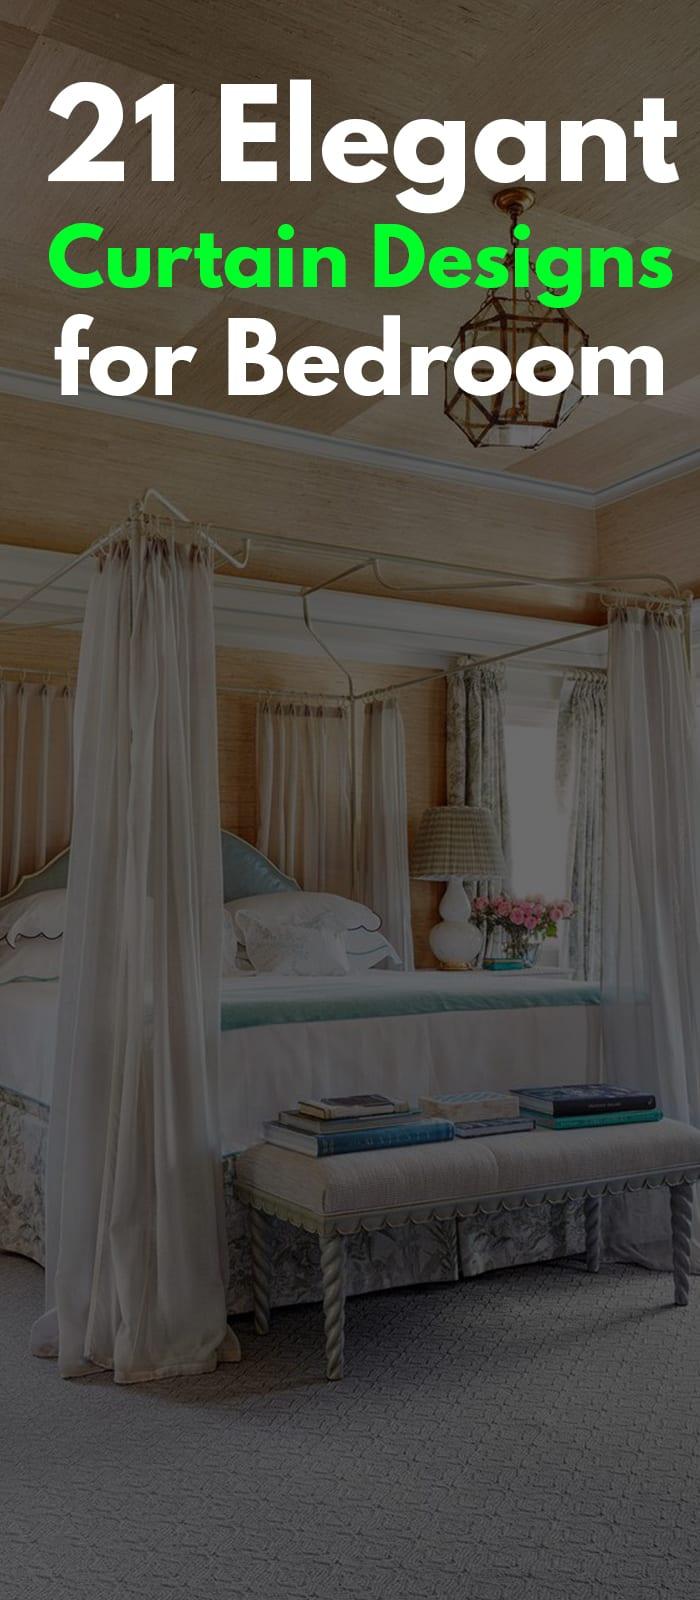 Beautiful bedroom curtain designs